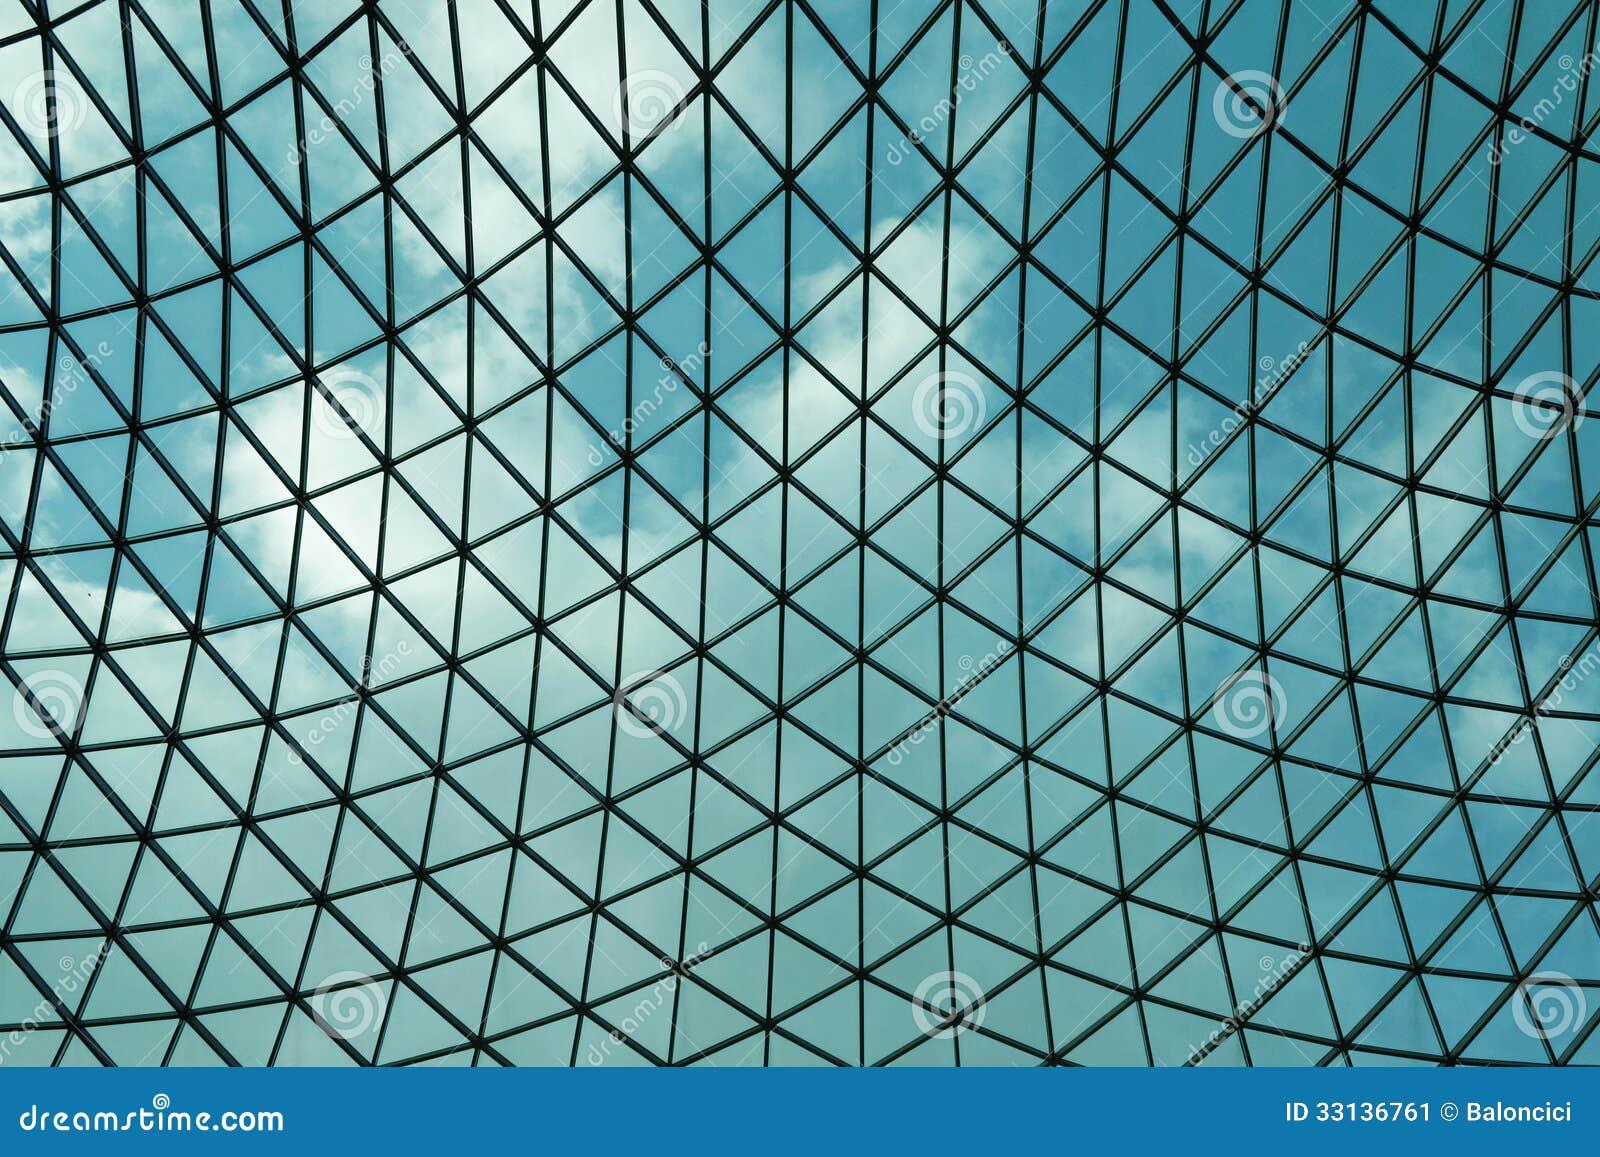 Geodesic Dome Stock Image - Image: 33136761